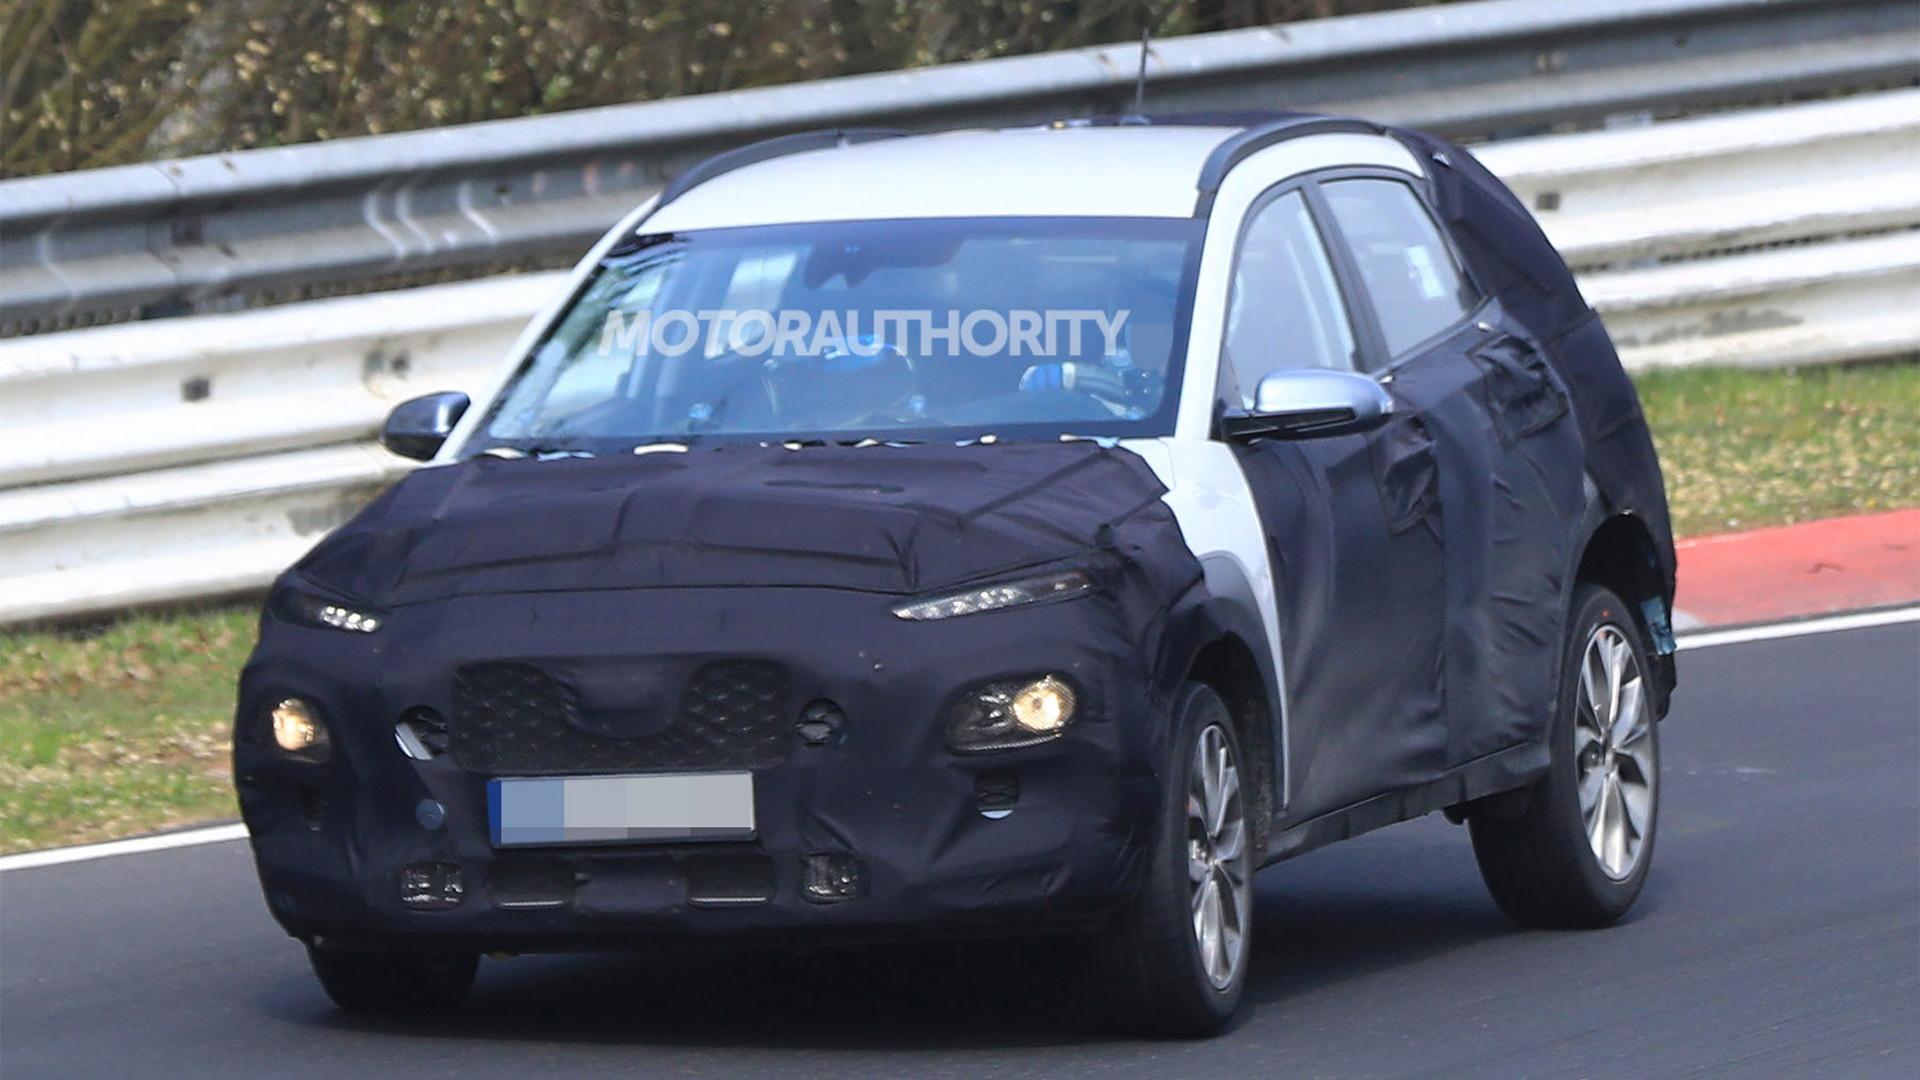 2018 Hyundai Kona spy shots - Image via S. Baldauf/SB-Medien